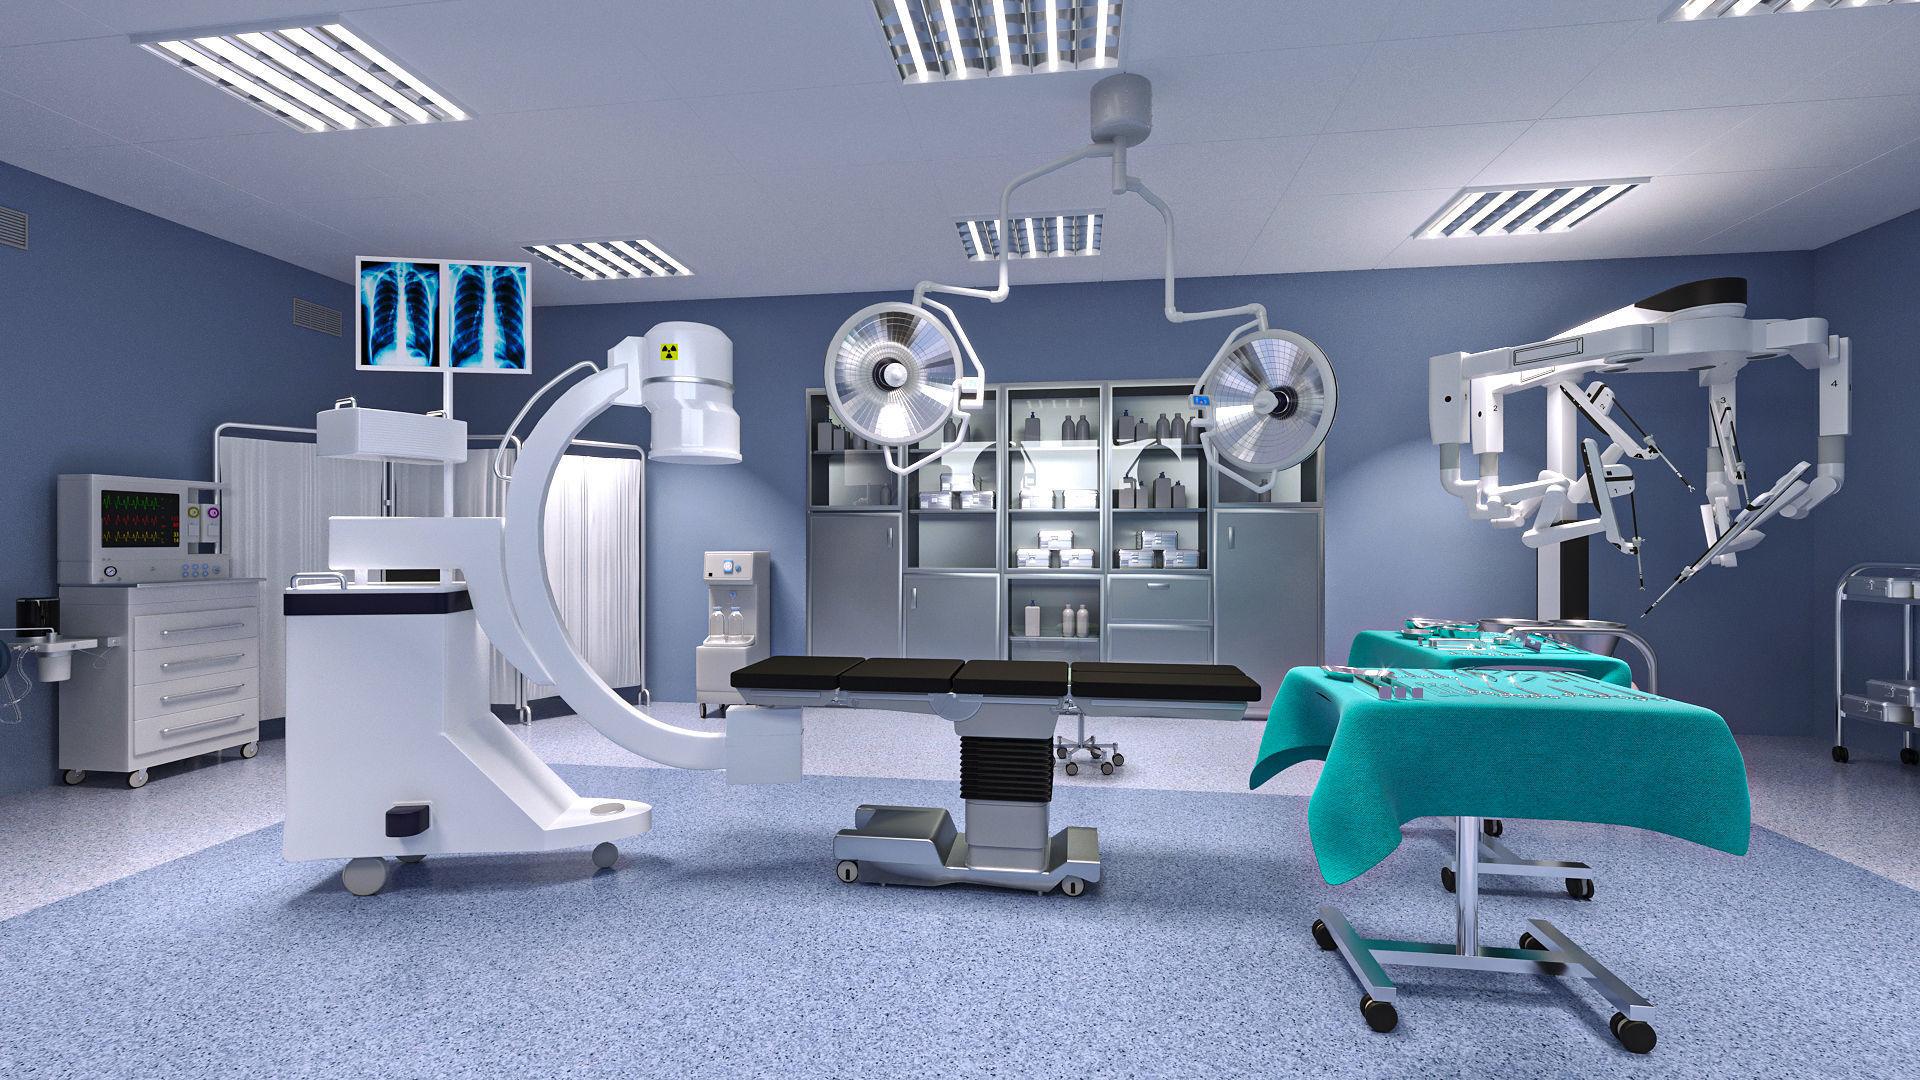 Operating Room 3D model